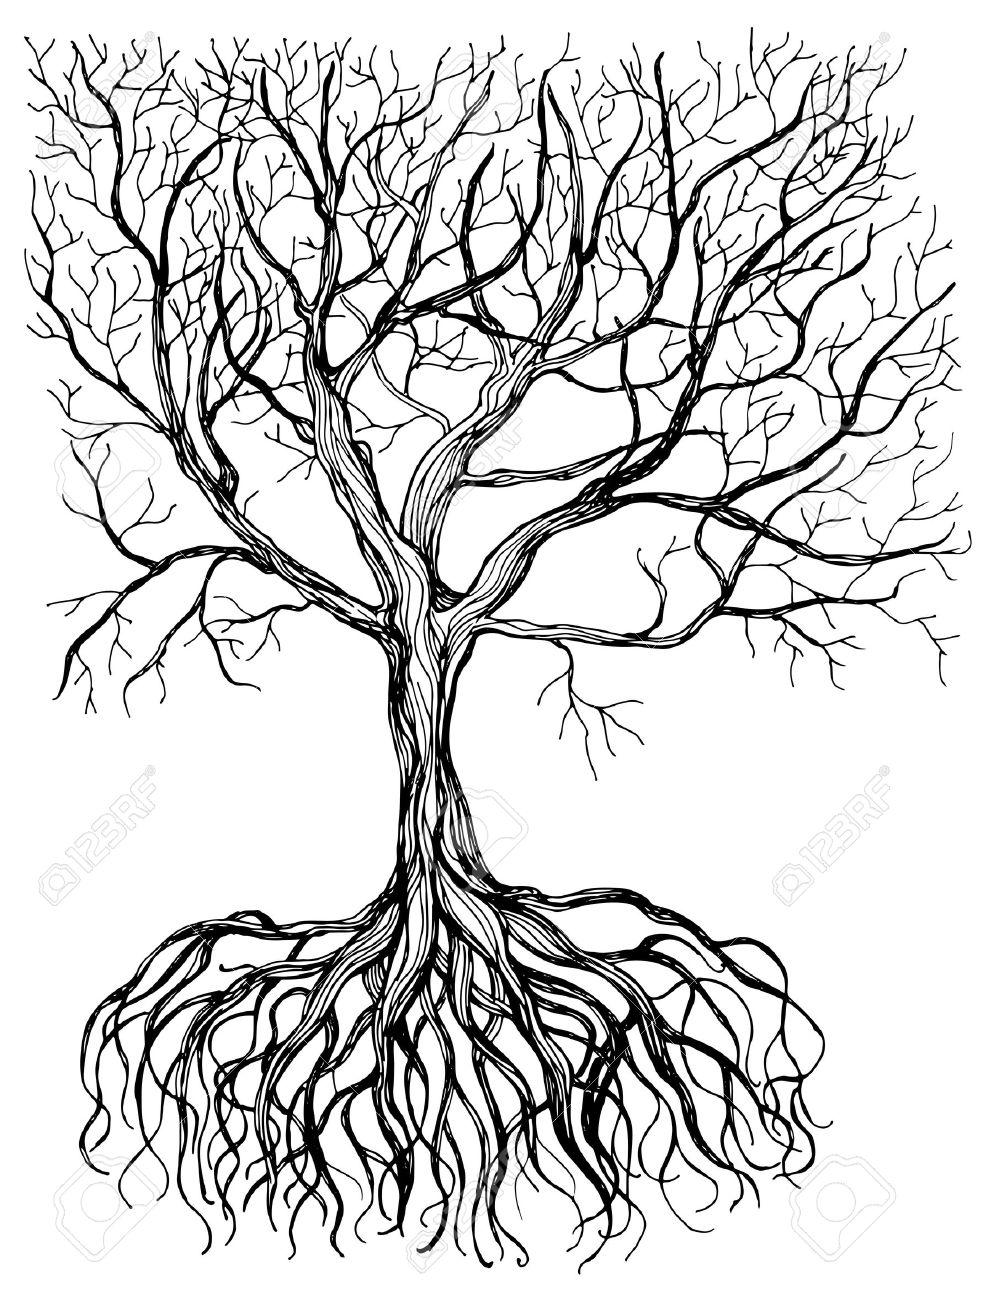 Arbre Avec Racine hand - attirée arbre avec racine sur fond blanc. clip art libres de